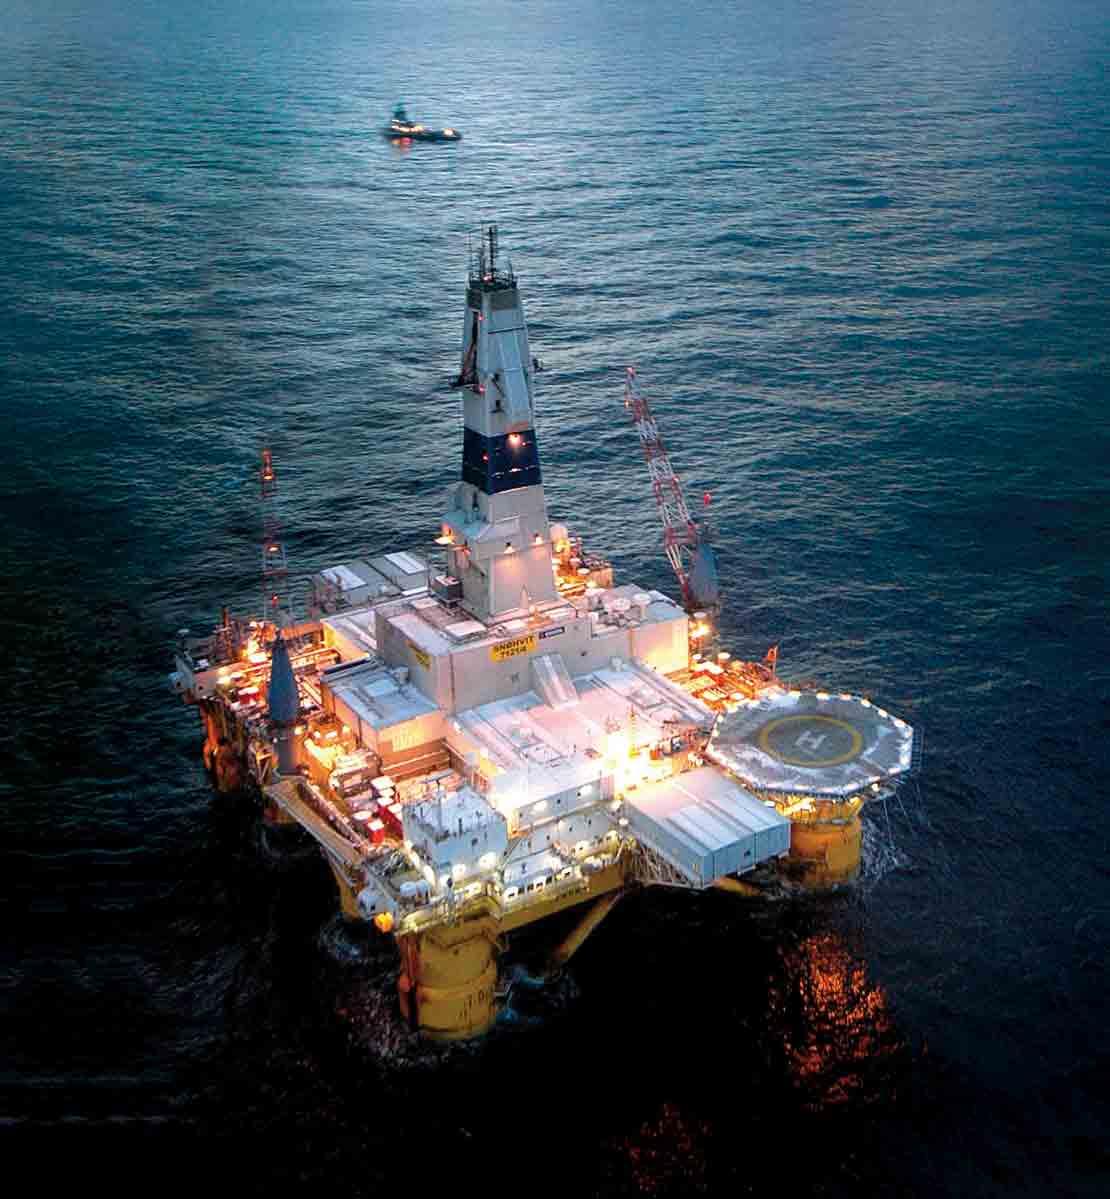 Offshore drilling platform in water.